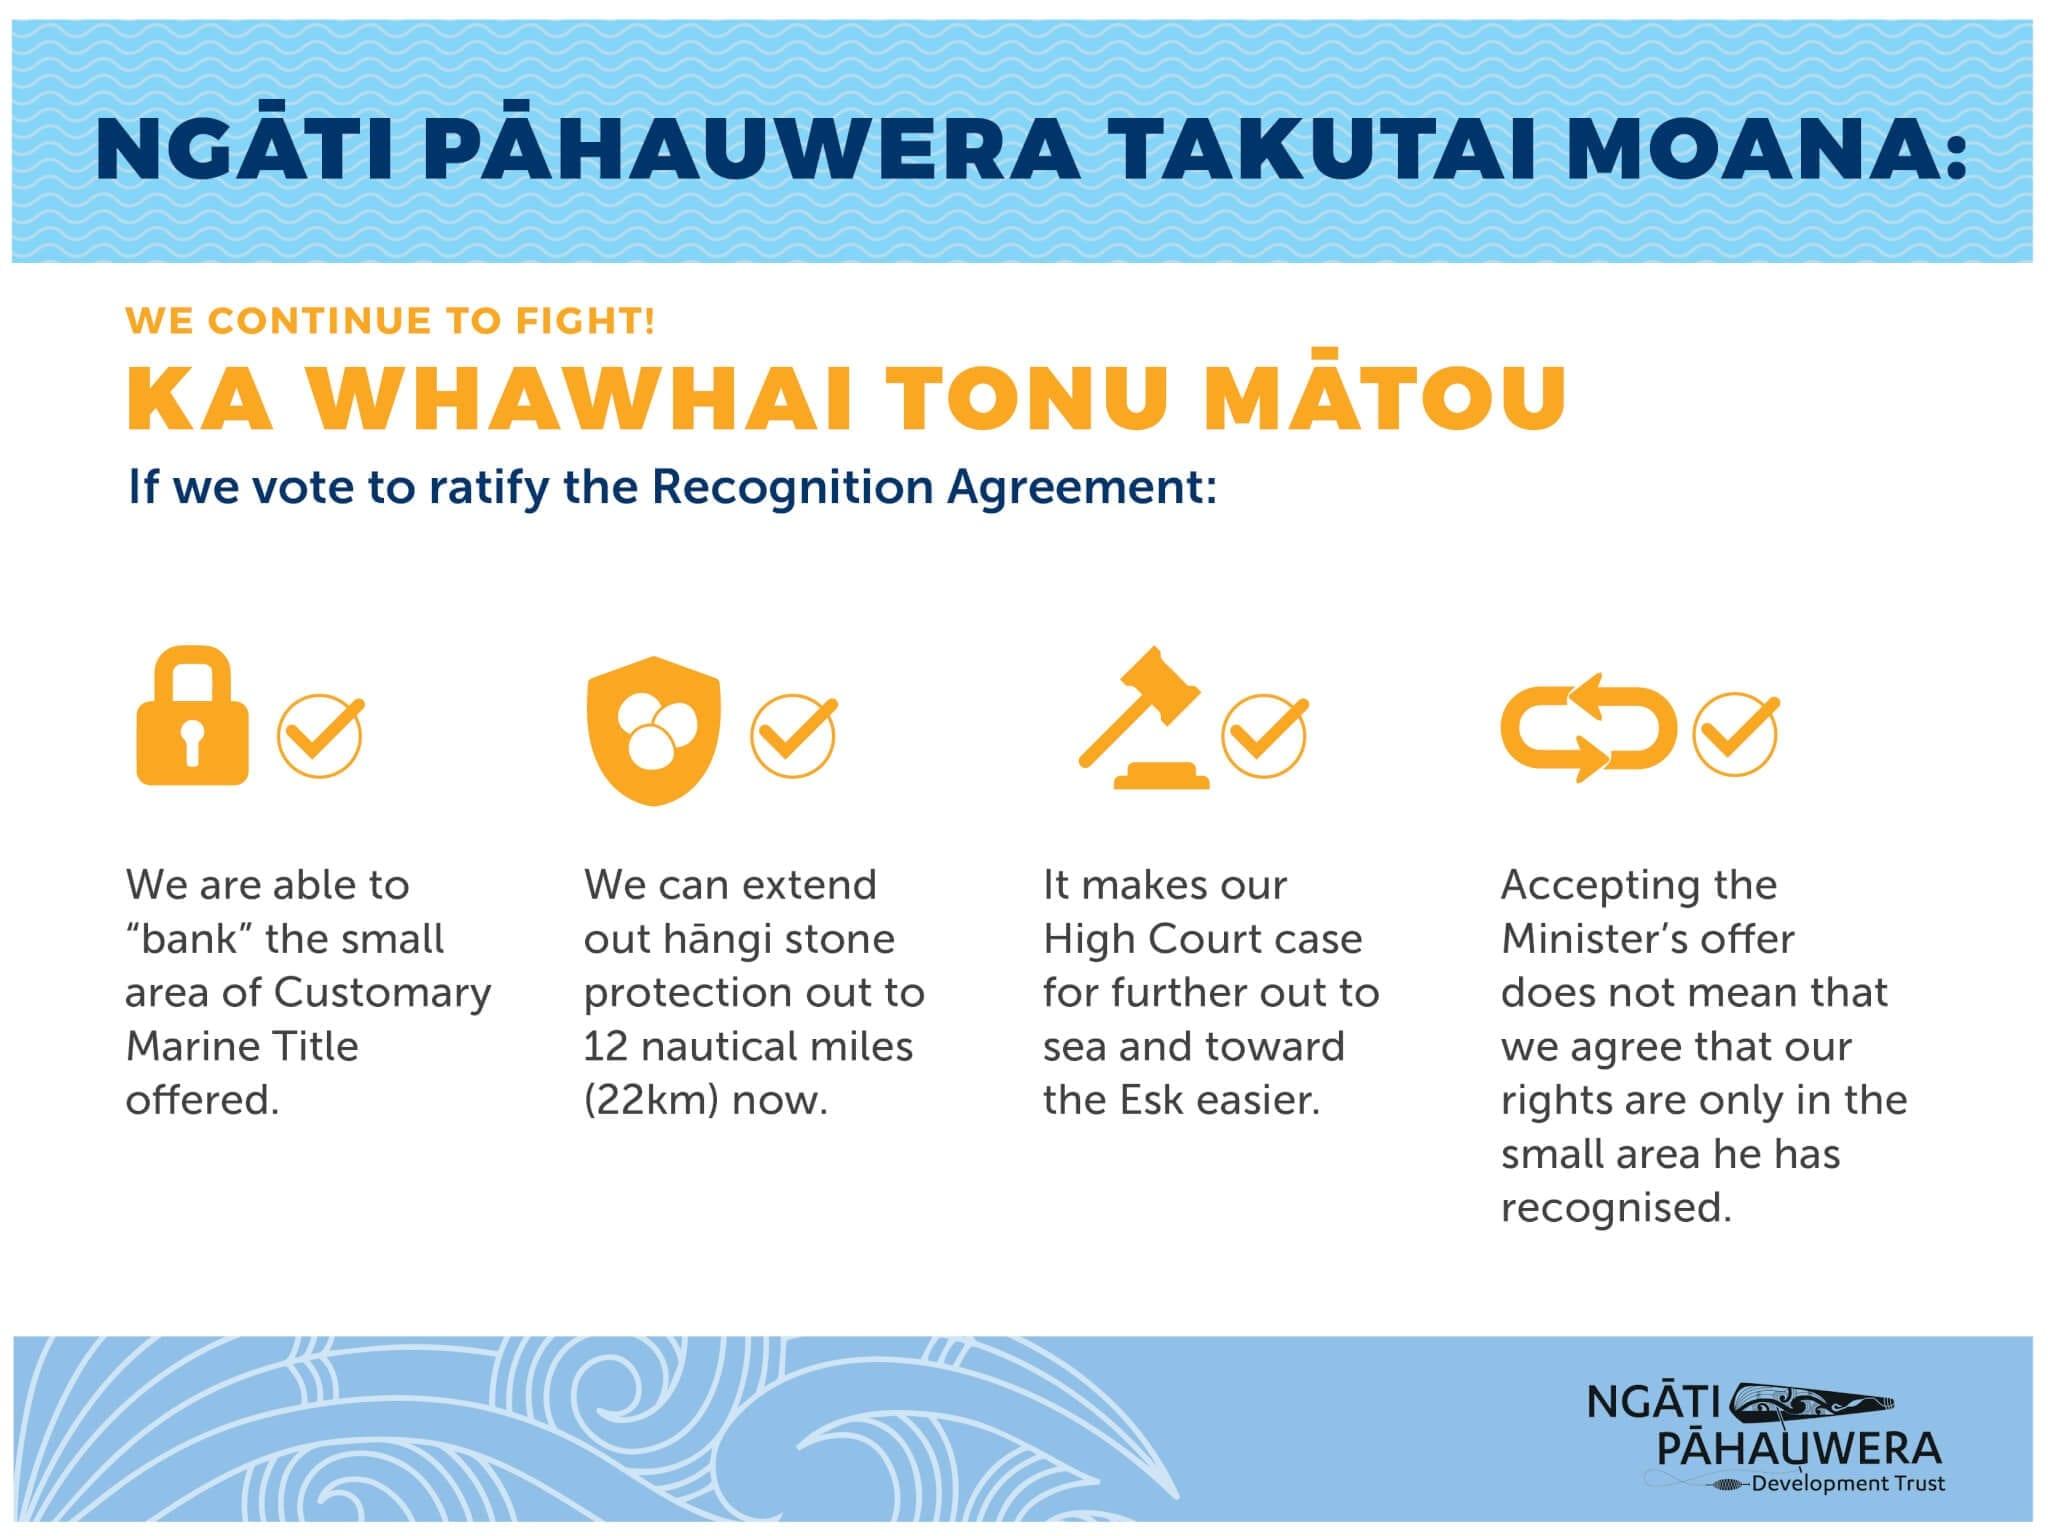 He Pānui: Ngāti Pāhauwera Takutai Moana